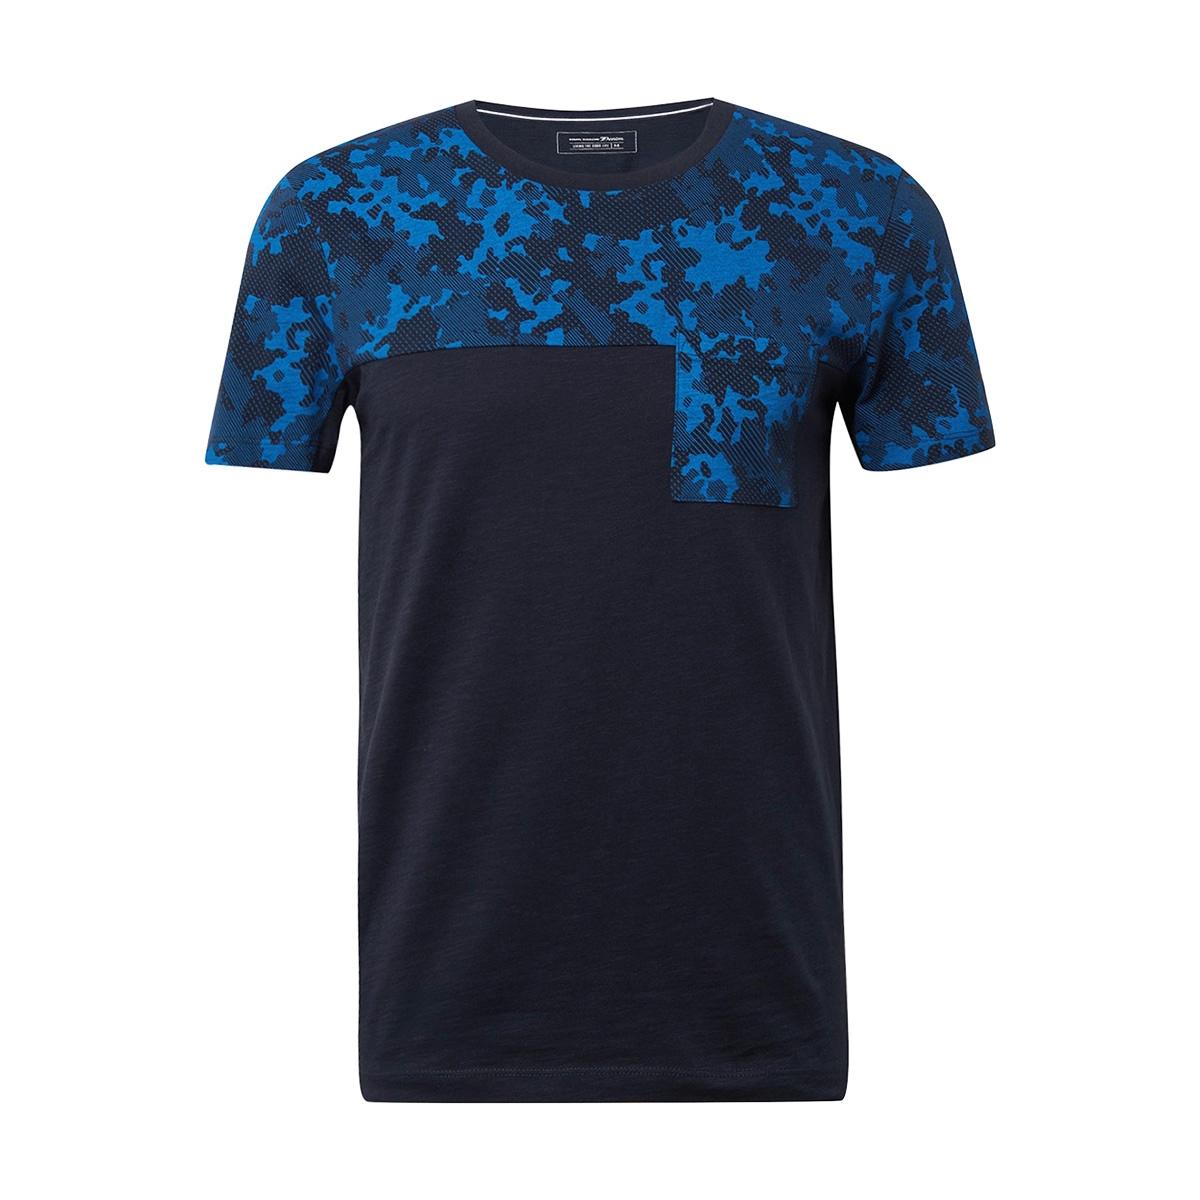 gestreept tshirt met print 1010033xx12 tom tailor t-shirt 10668